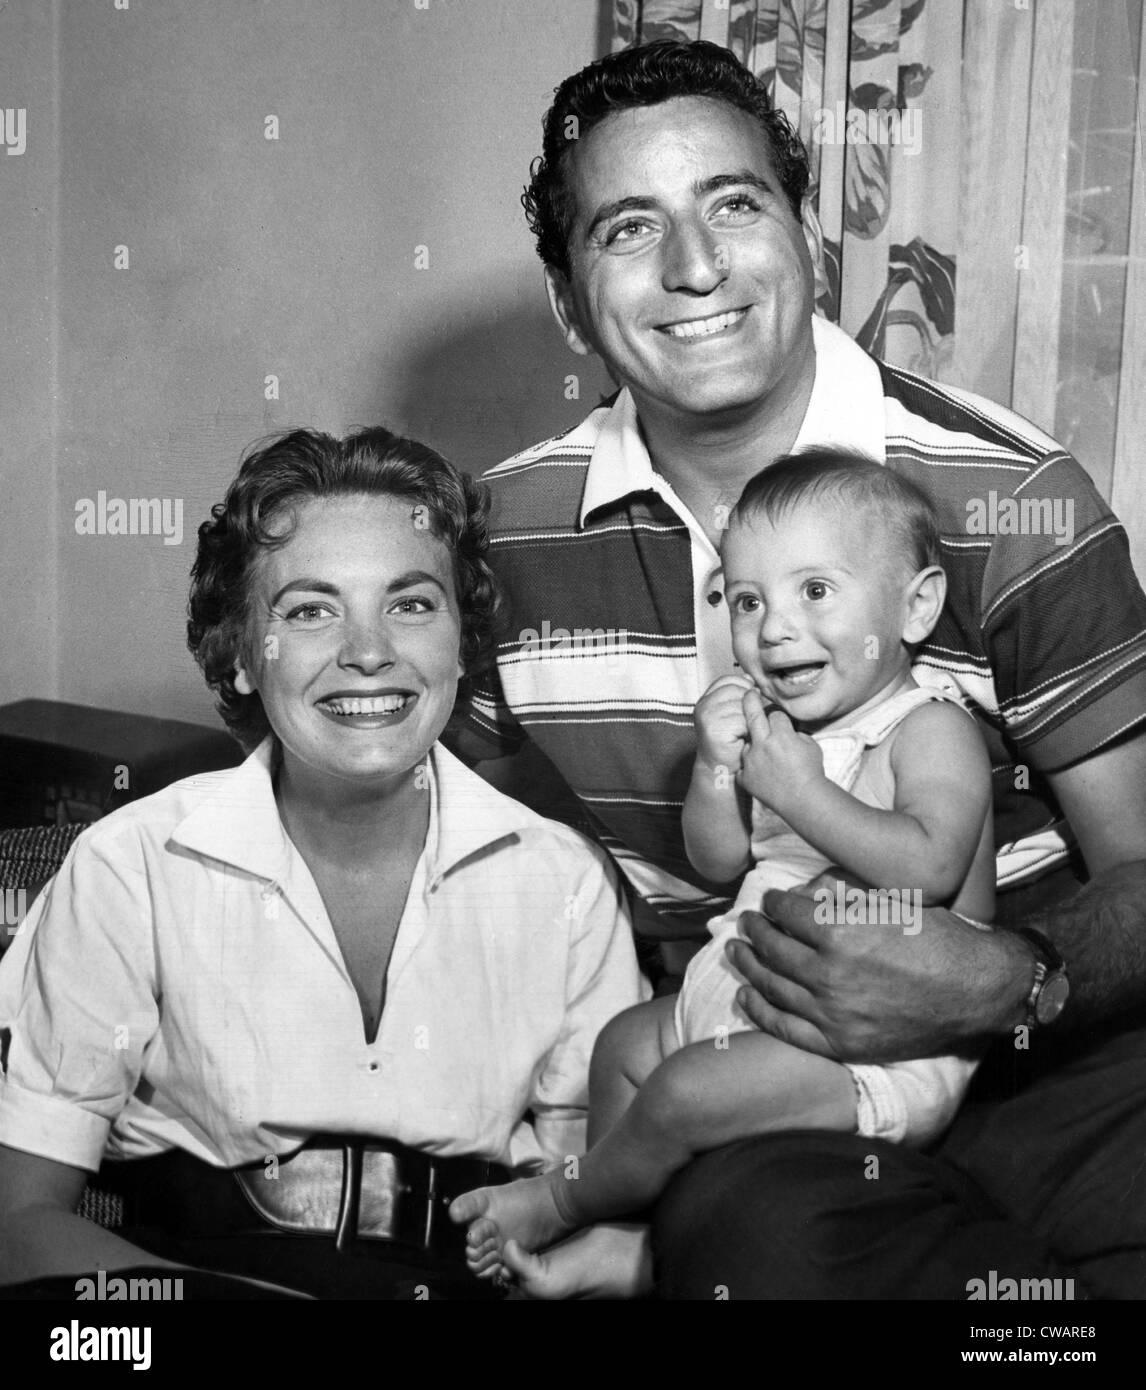 Tony Bennett, wife Patricia, son D'Andrea, c. 1954.. Courtesy: CSU Archives / Everett Collection - Stock Image